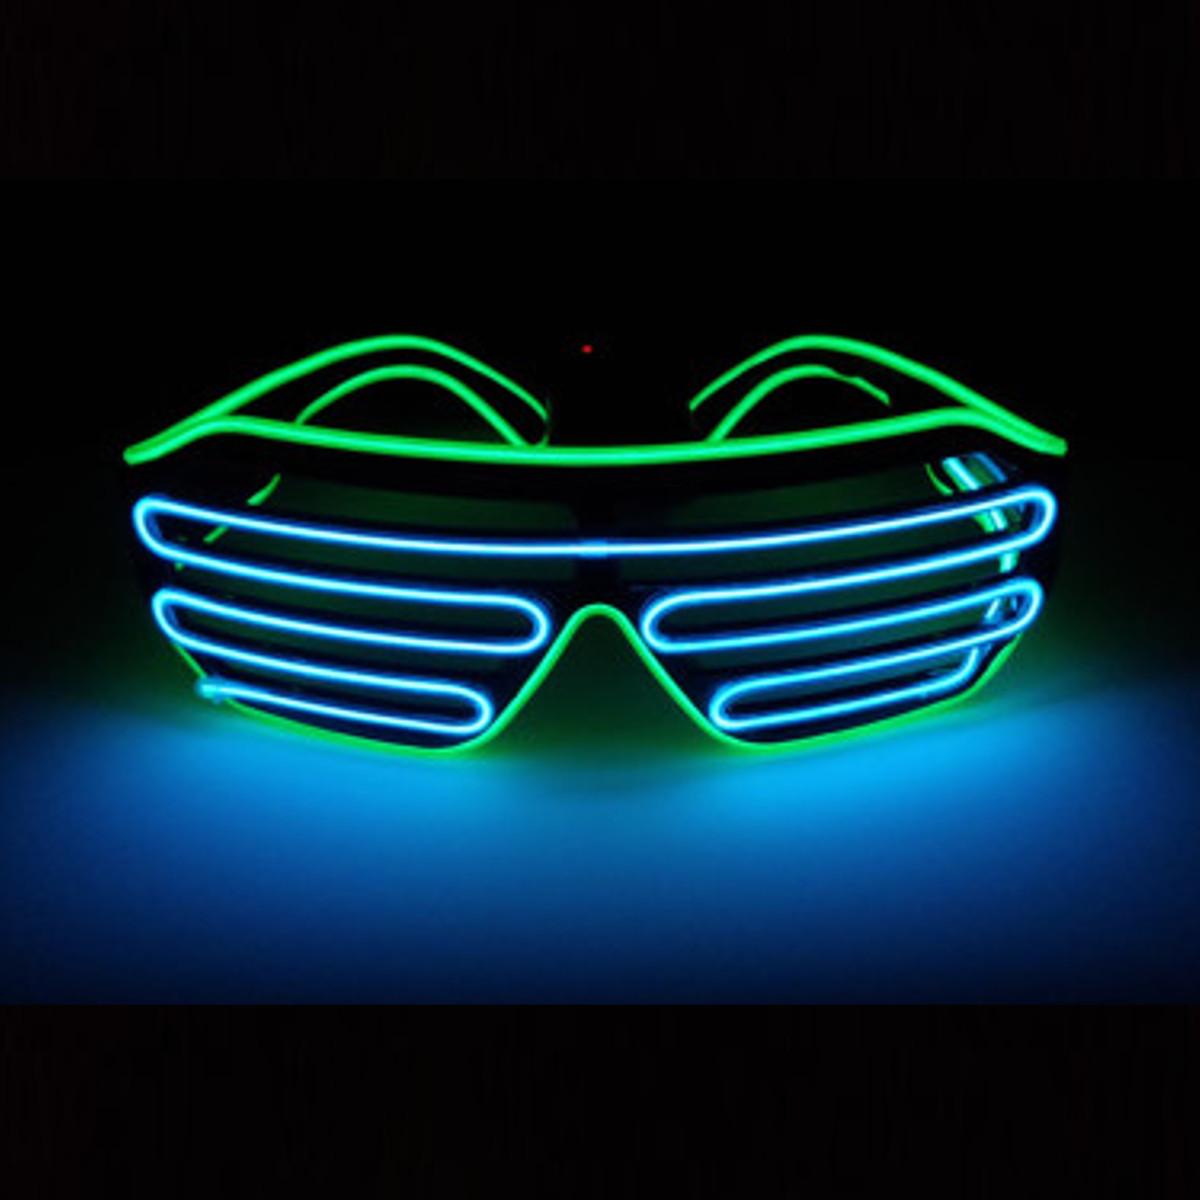 El Wire Neon LED Sound Control Light Up Glow Sunglasses ...